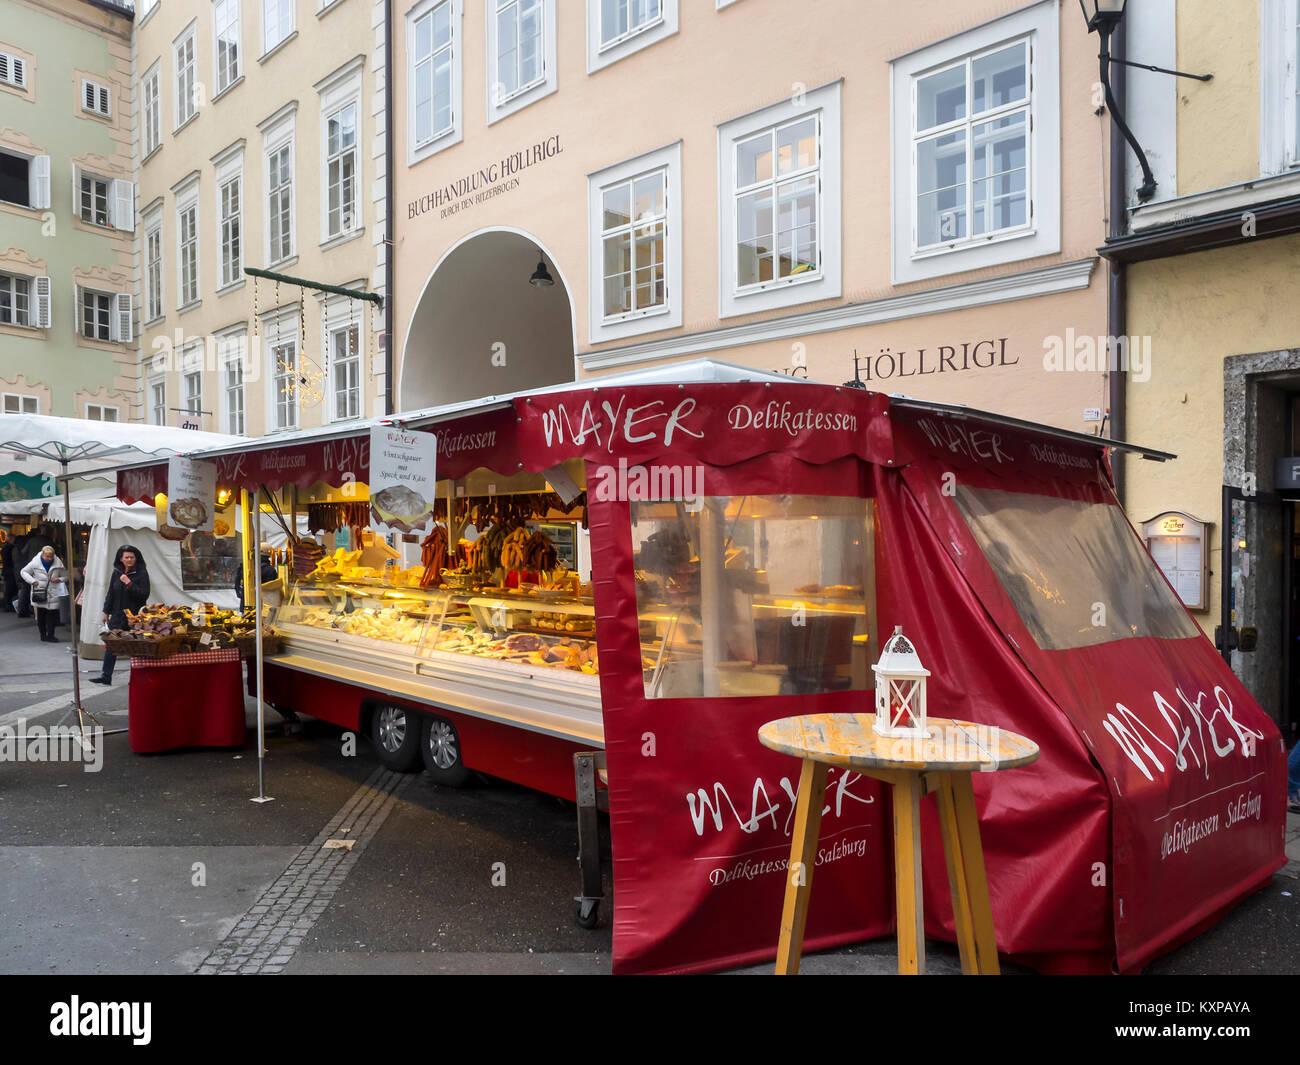 SALZBURG, AUSTRIA:  Mayer Delikatessen -  a mobile Delicatessen in the Universitätsplatz Market - Stock Image